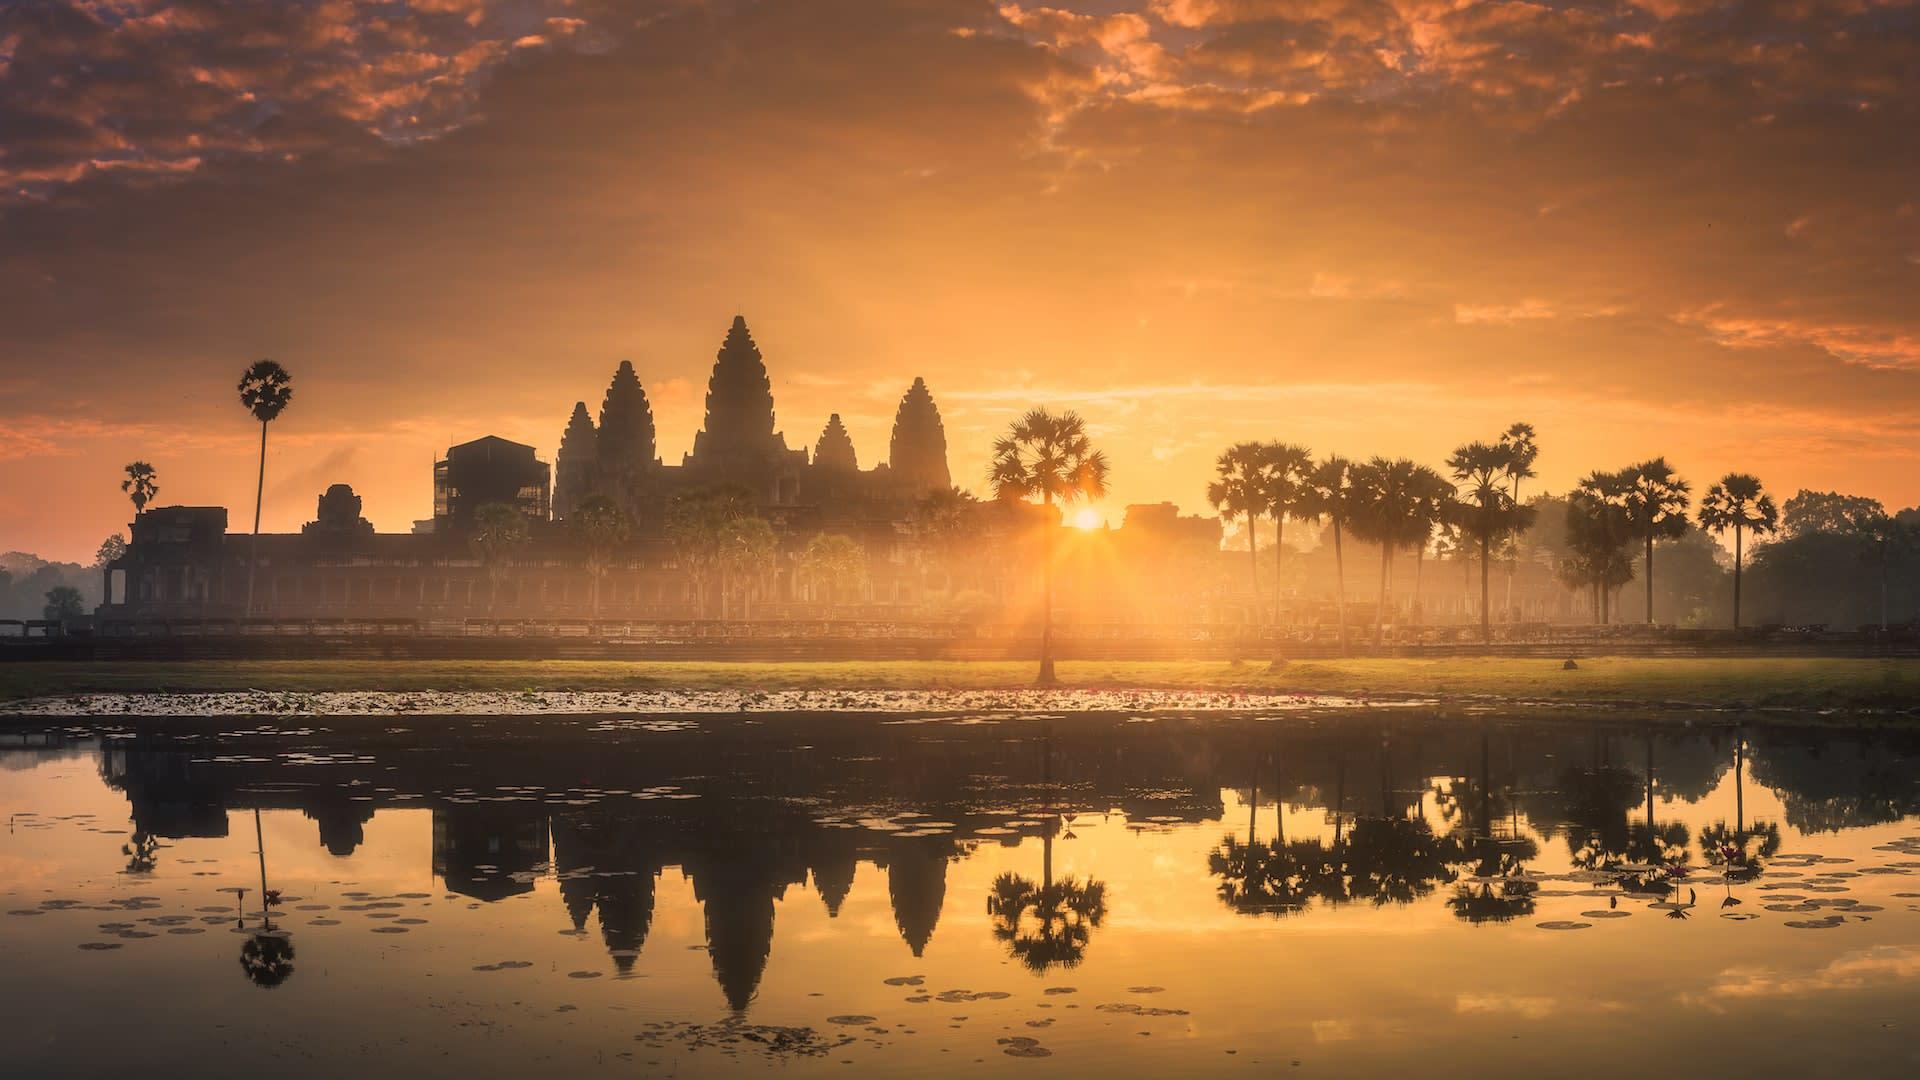 Bucket list vacations to Angkor Wat